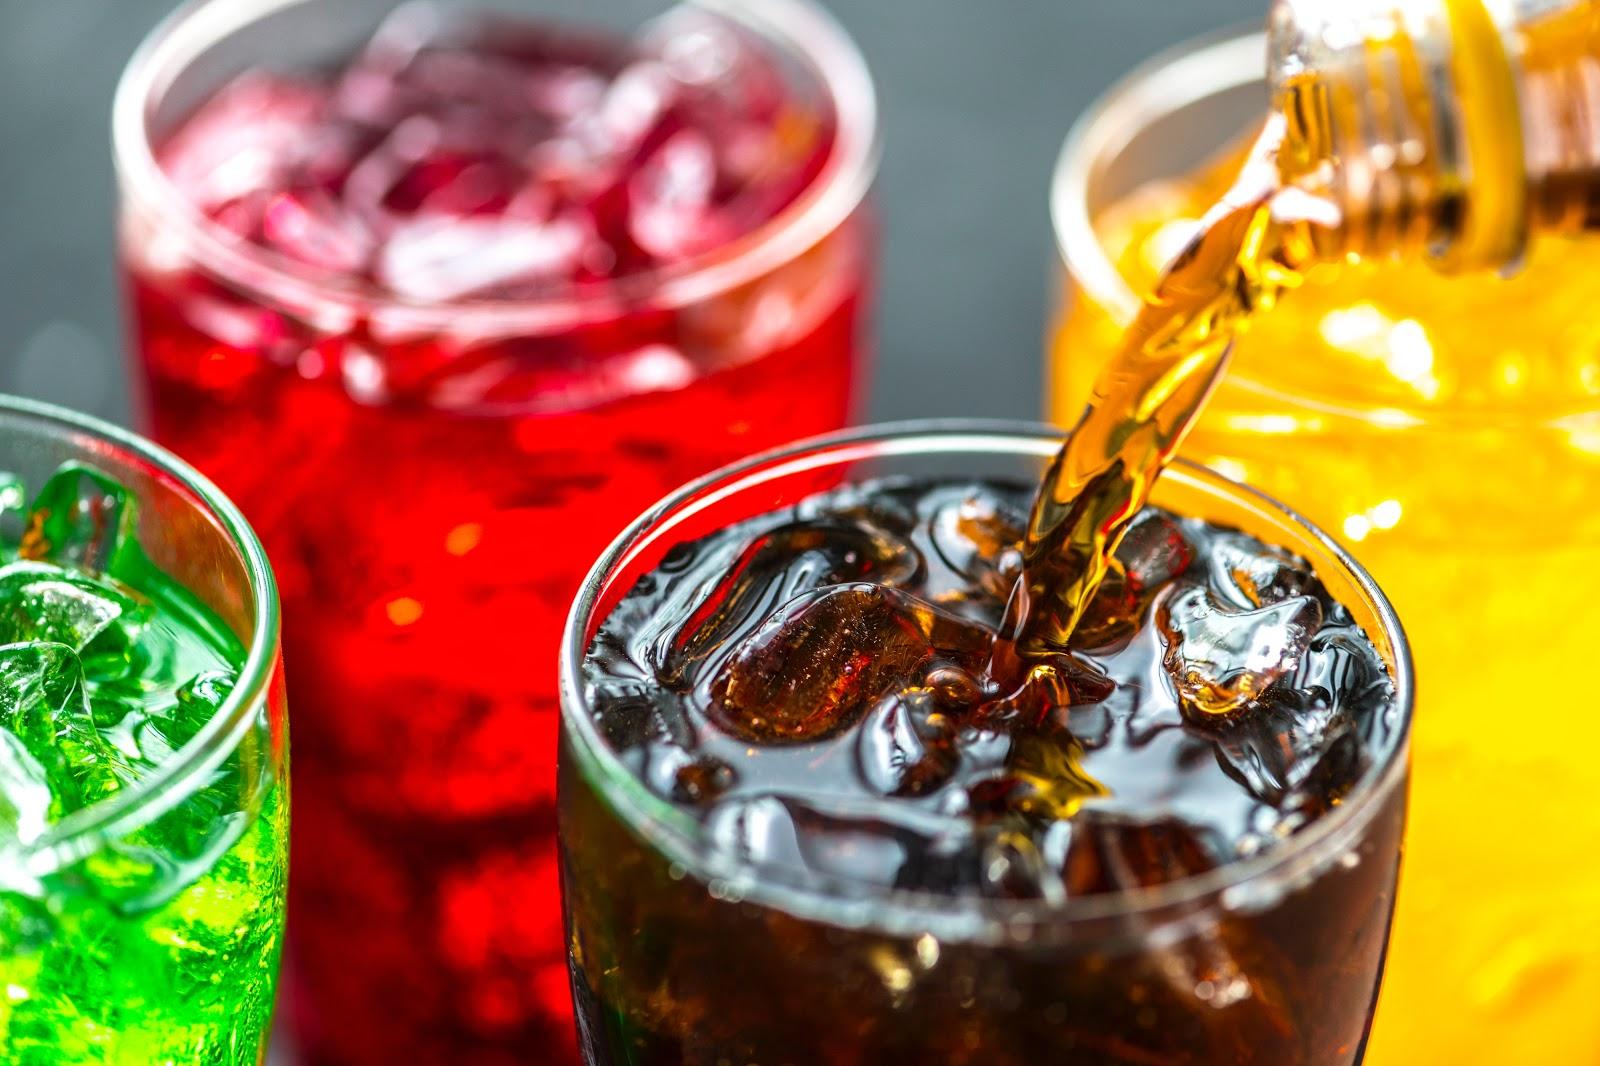 Sugary Soda Drinks